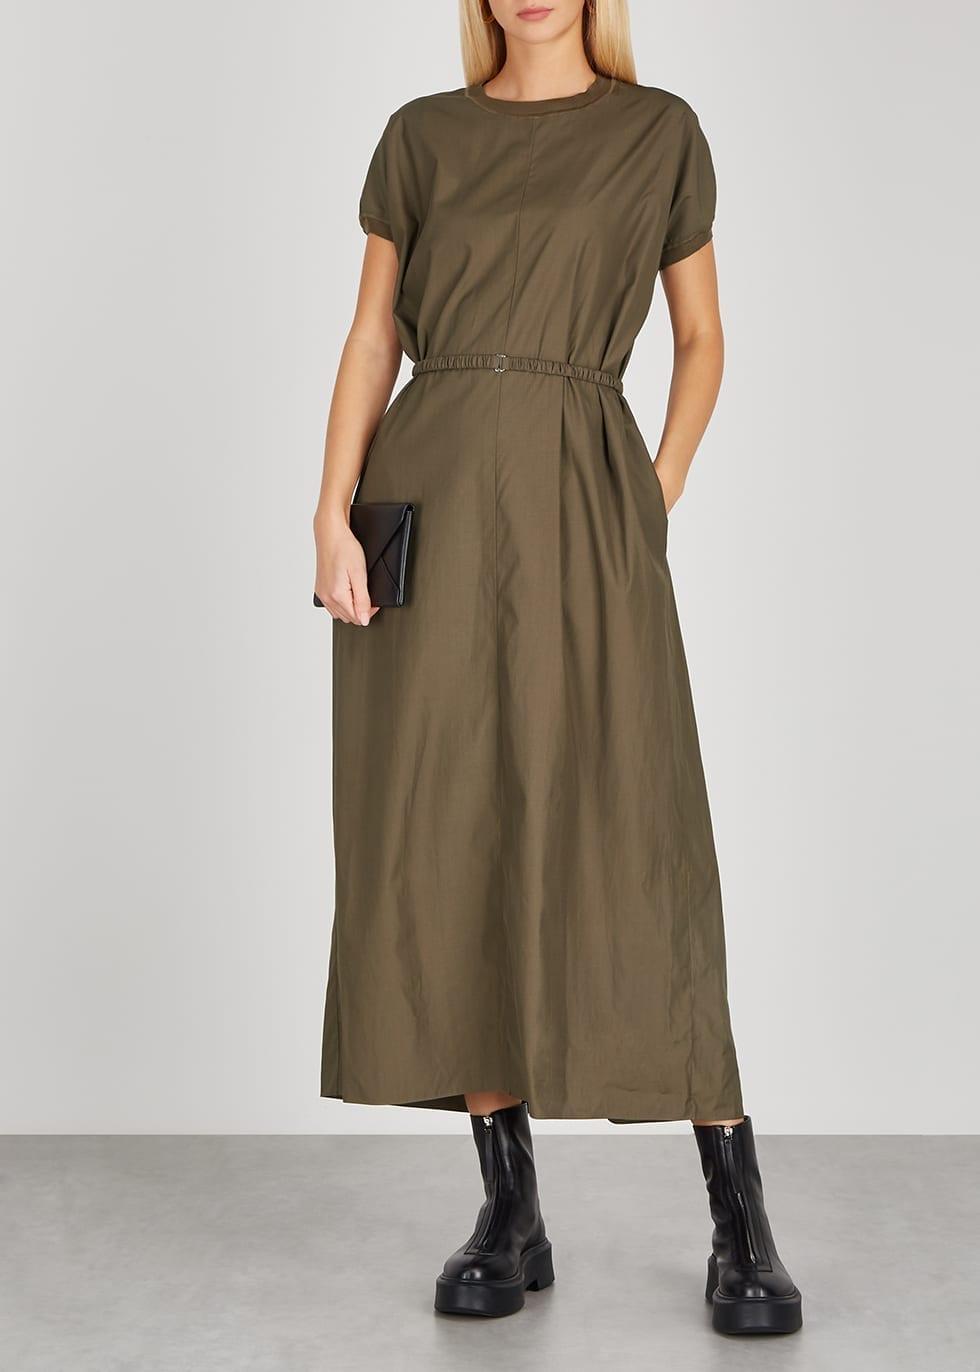 THE ROW Mafalda Army Green Belted Maxi Dress